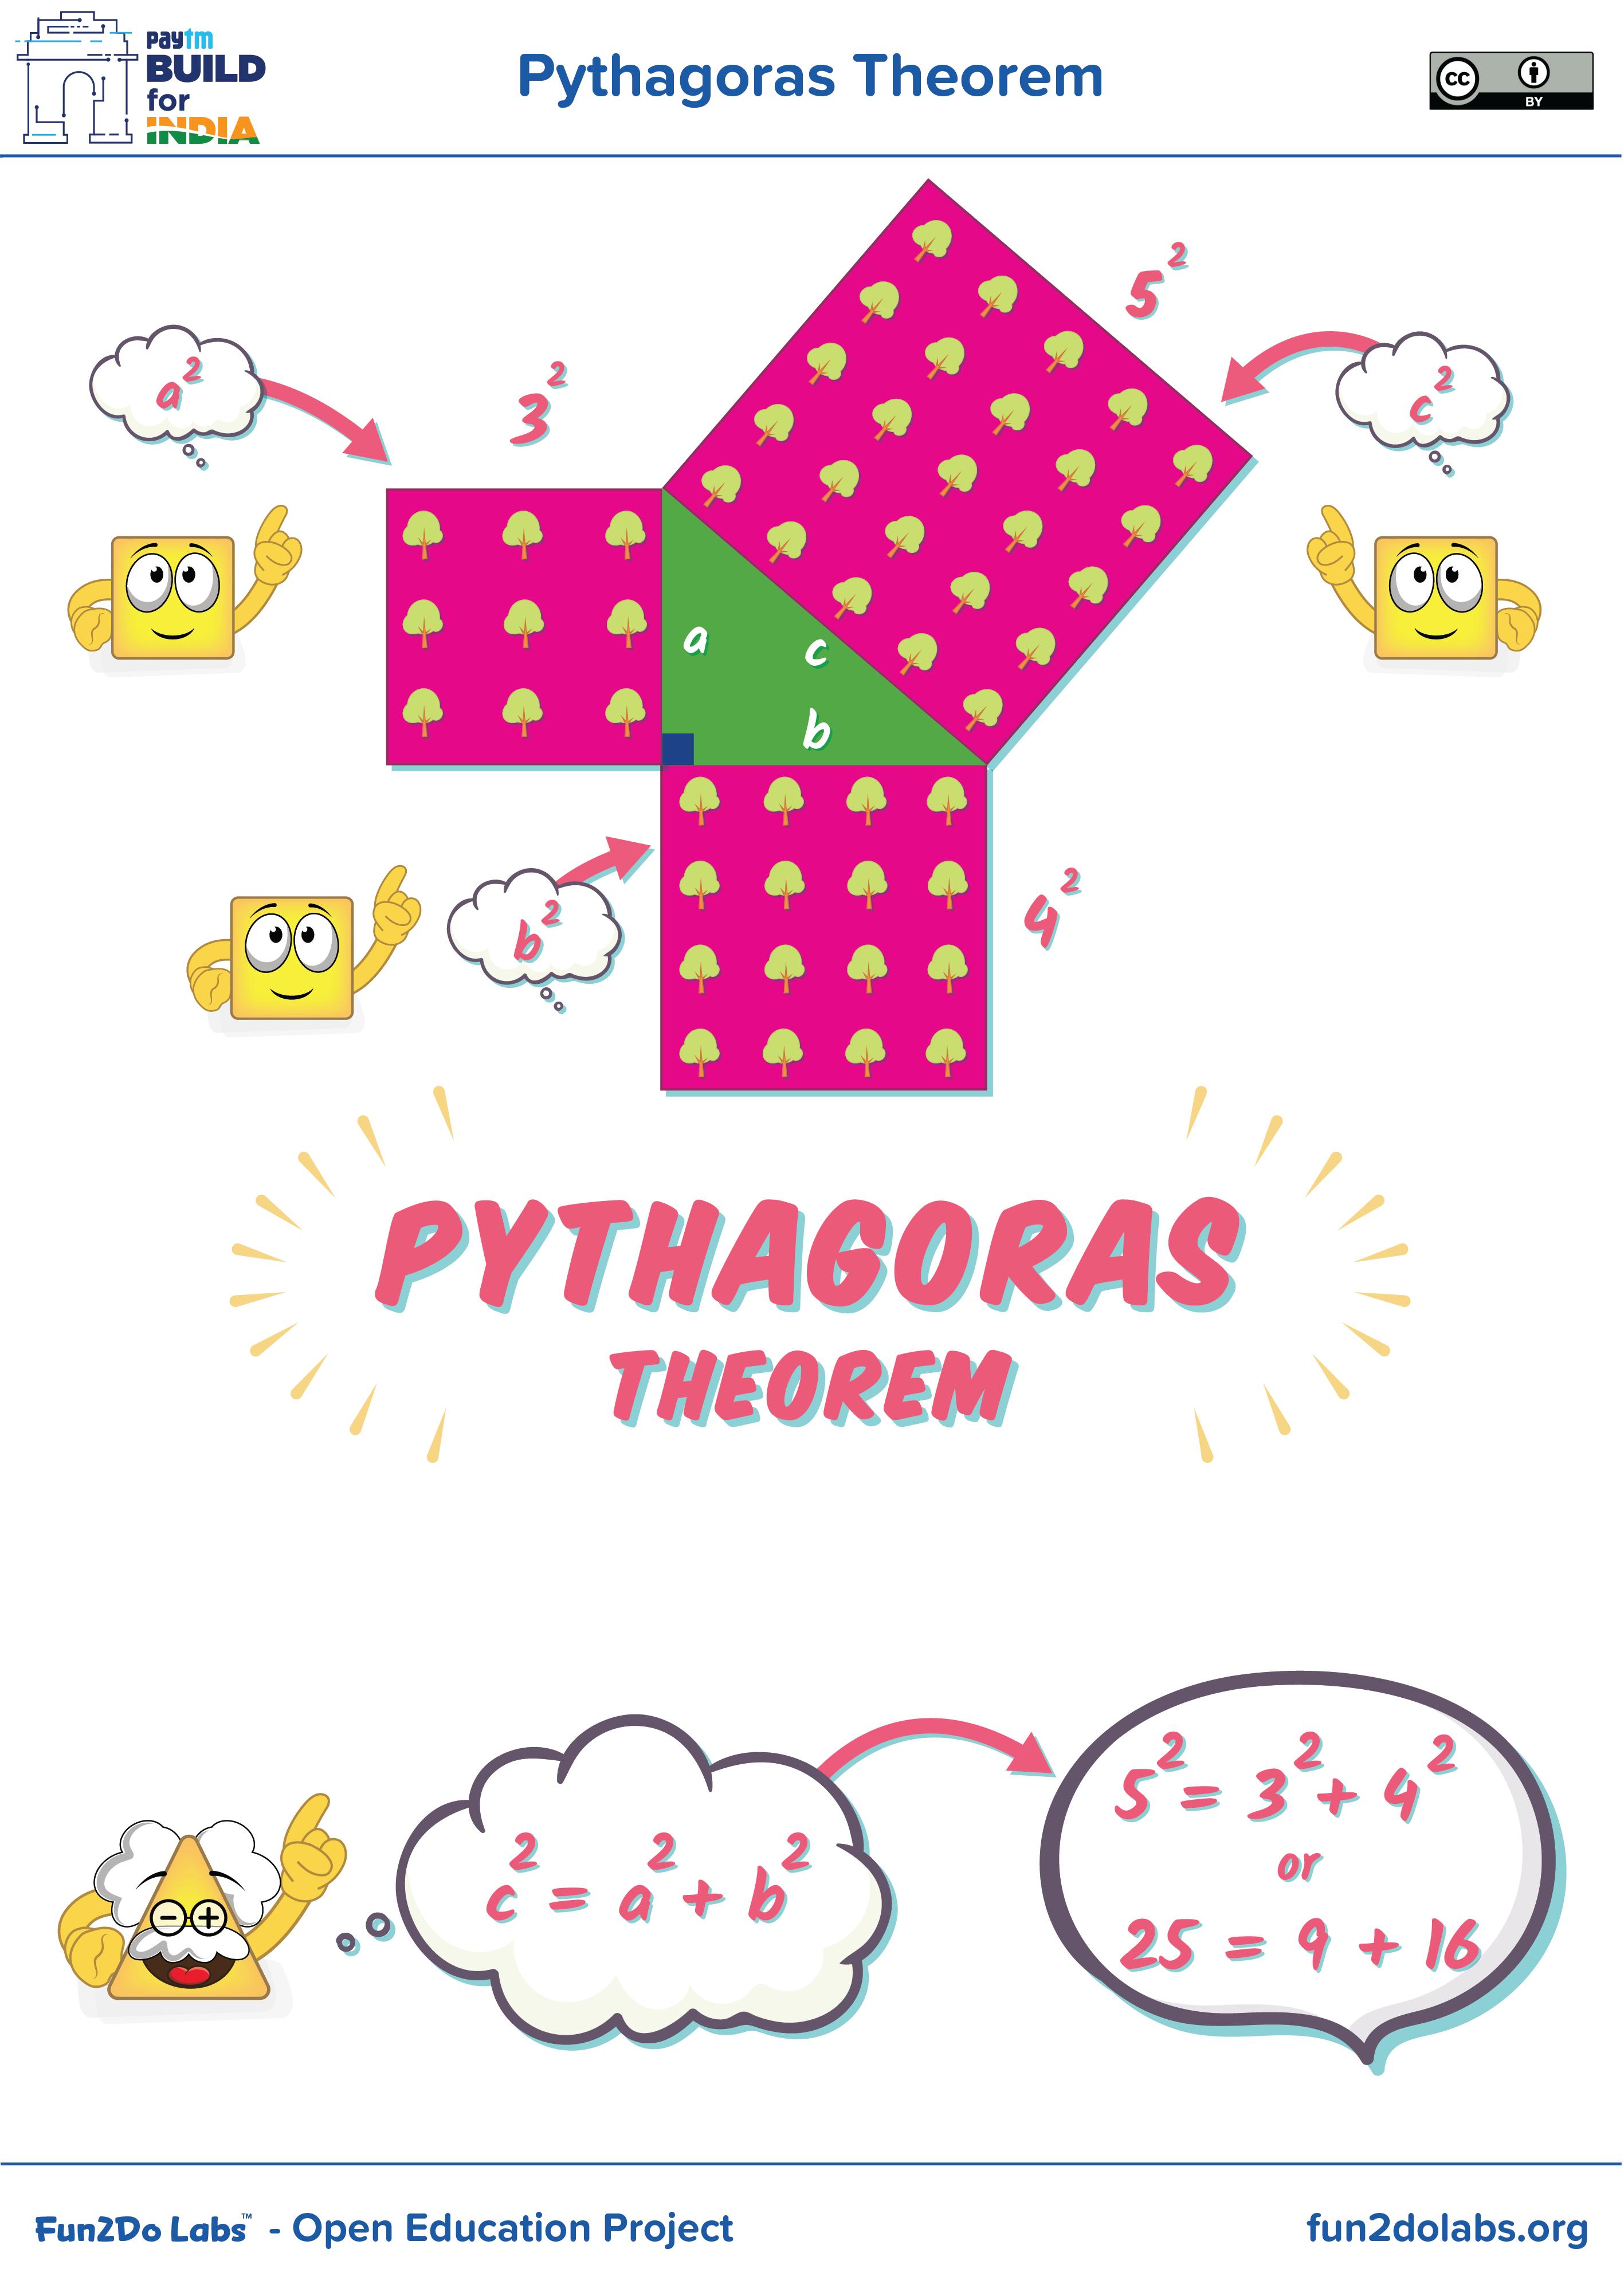 The Pythagorean Theorem was created by Pythagoras, a Greek